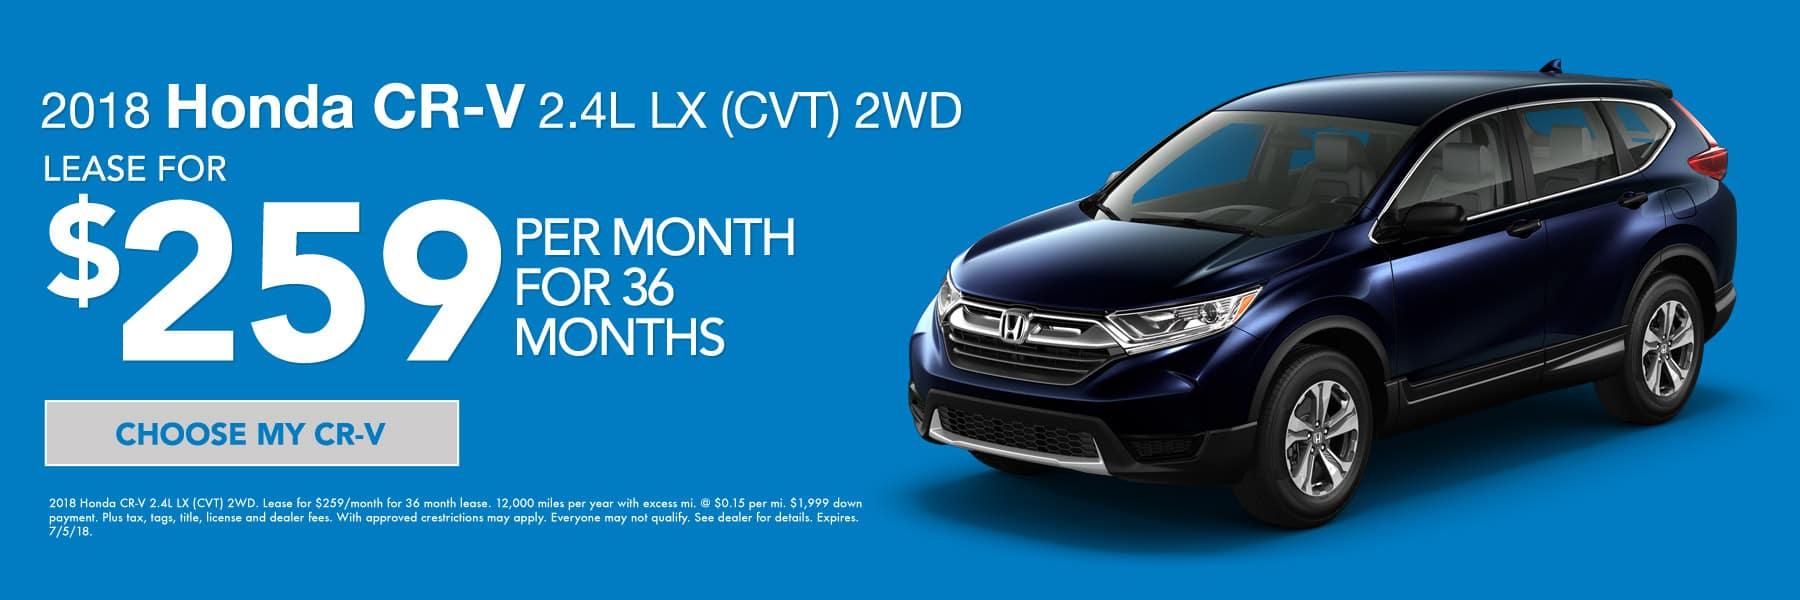 2018 Honda CR-V 2.4L LX (CVT) 2WD - Lease for $259/month for 36 months - Choose my CR-V